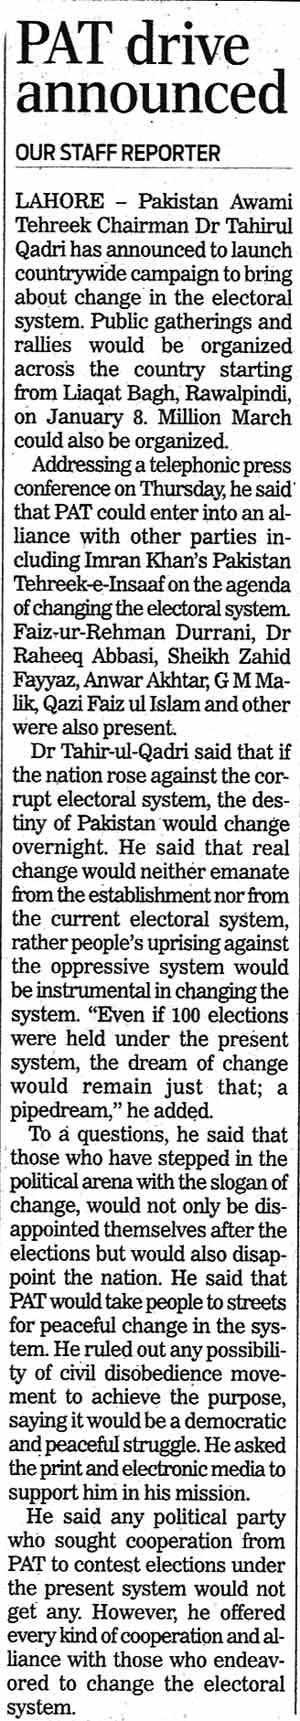 تحریک منہاج القرآن Minhaj-ul-Quran  Print Media Coverage پرنٹ میڈیا کوریج DailyThe  Nation Page 13